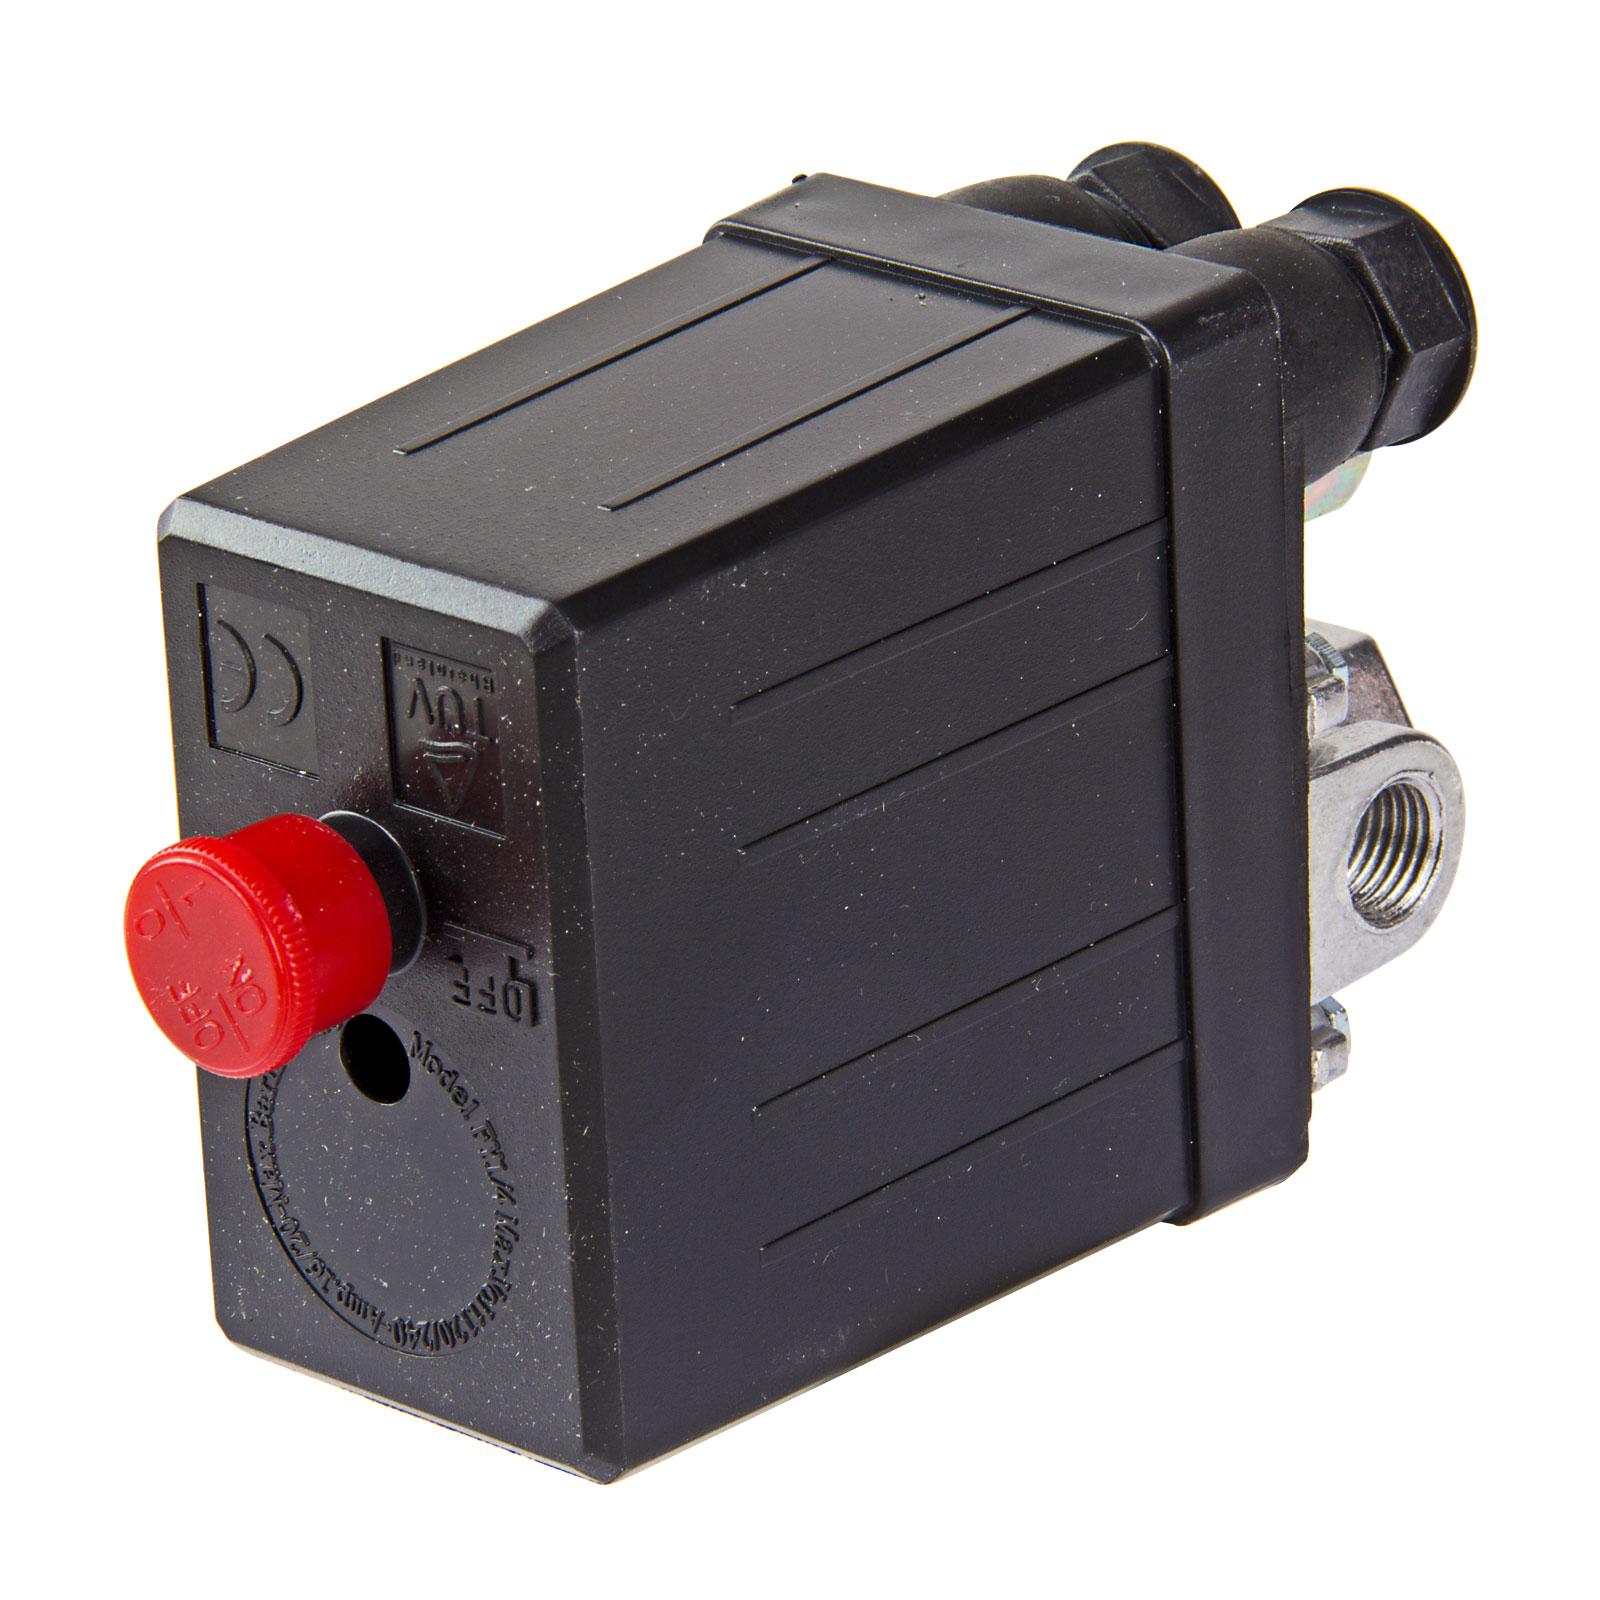 Druckschalter-Schalter-12-Bar-220-240V-fuer-Kompressor-24210-NEU-ZA24219